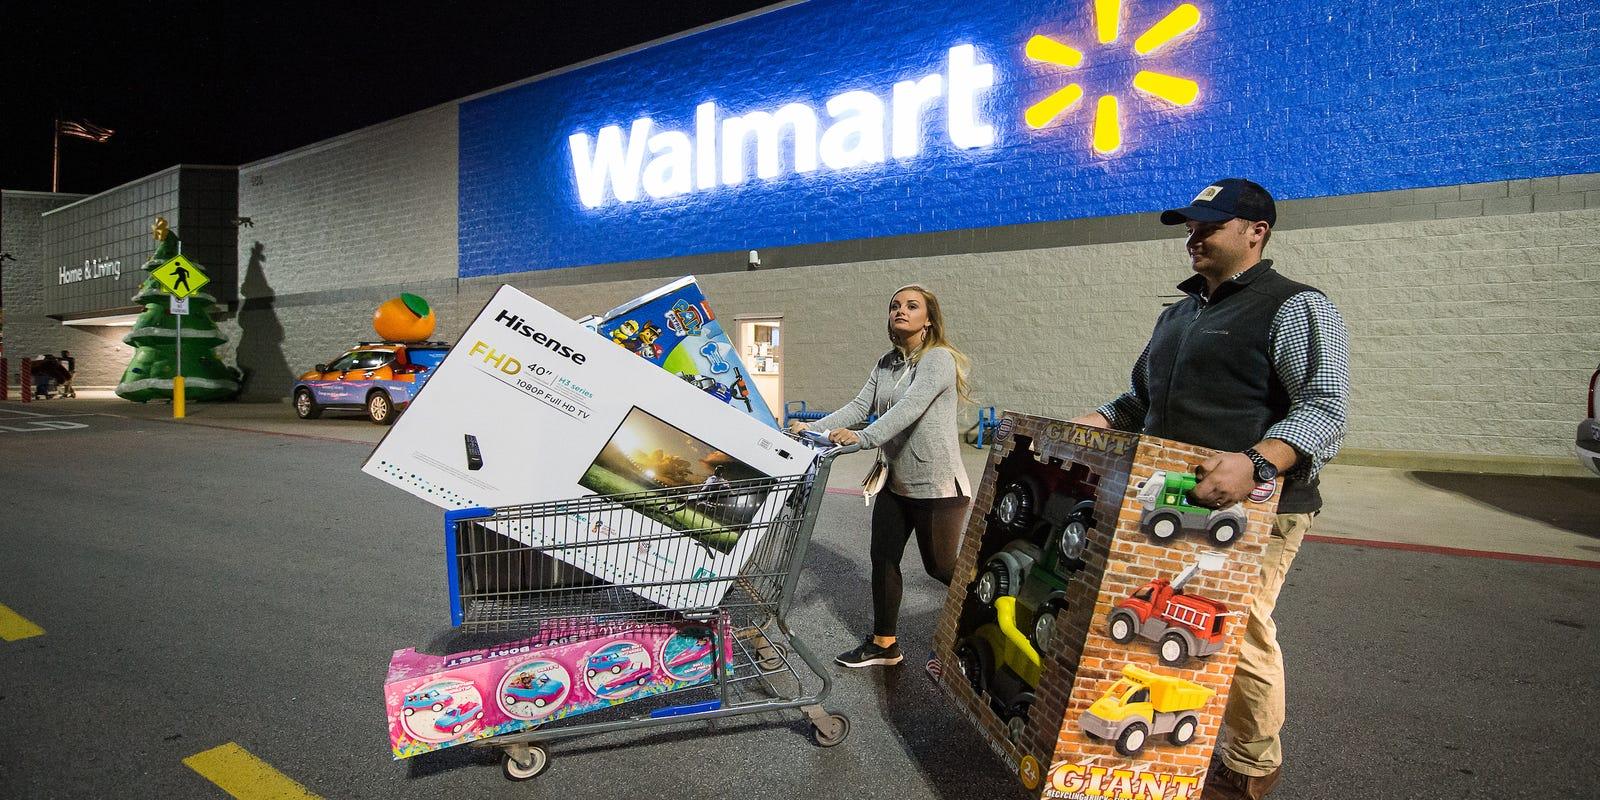 Walmart Black Friday ad 2019: Televisions, electronics, toy deals